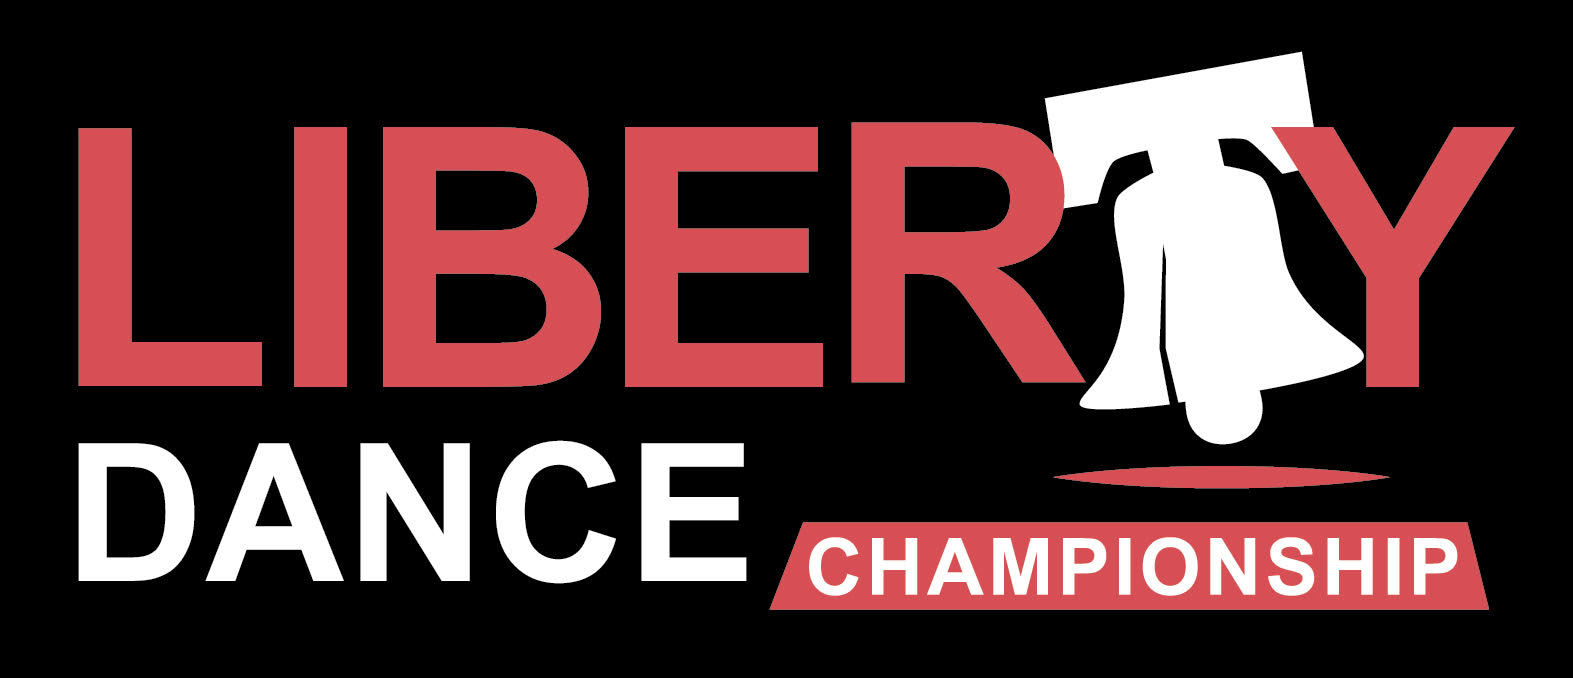 Liberty dance championship website use